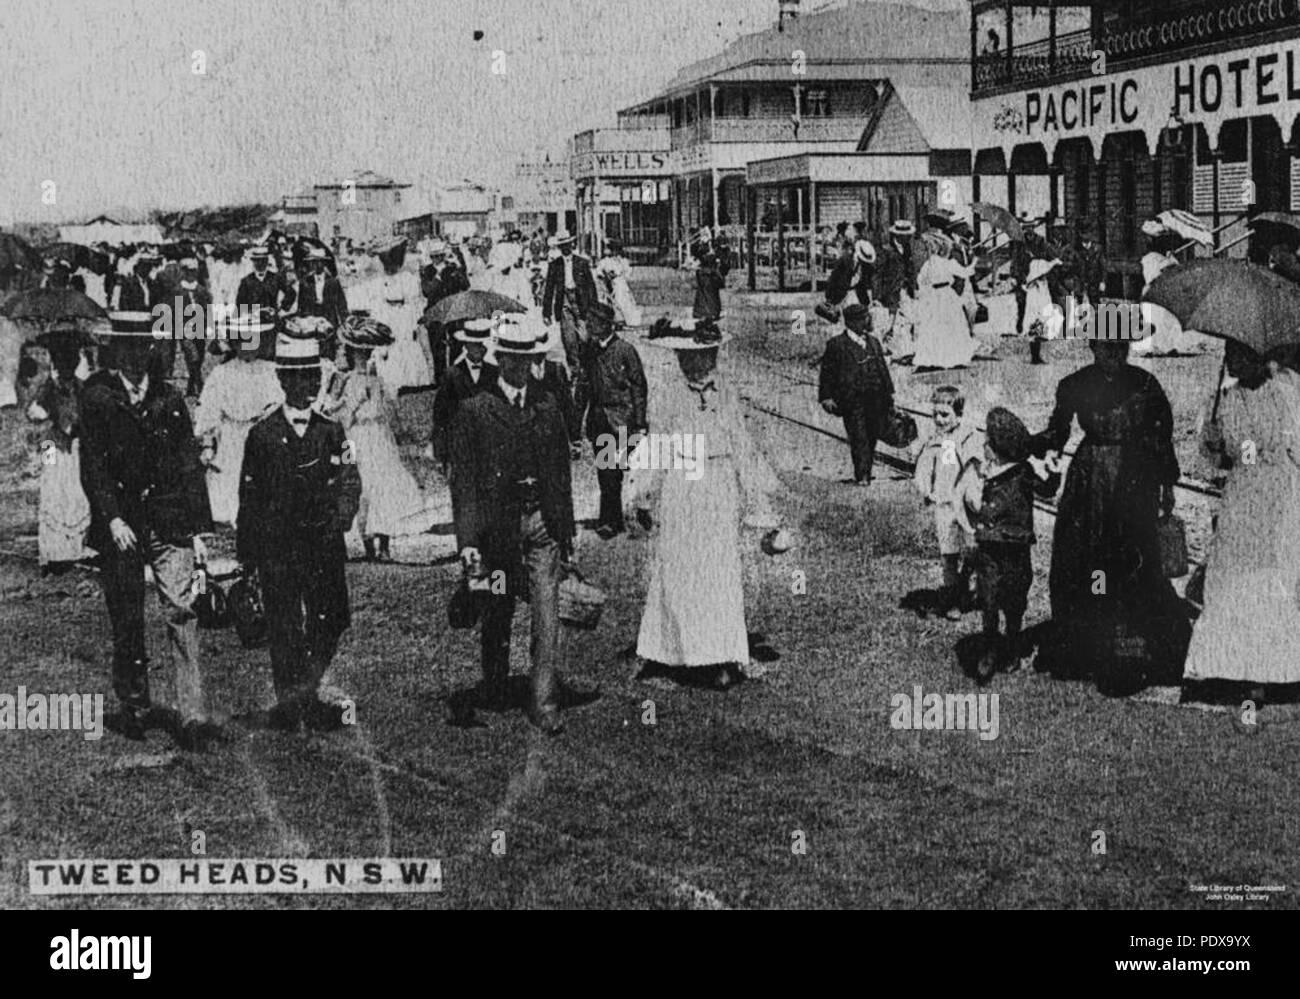 277 StateLibQld 1 95588 Wharf Street Tweed Heads NSW Ca 1906